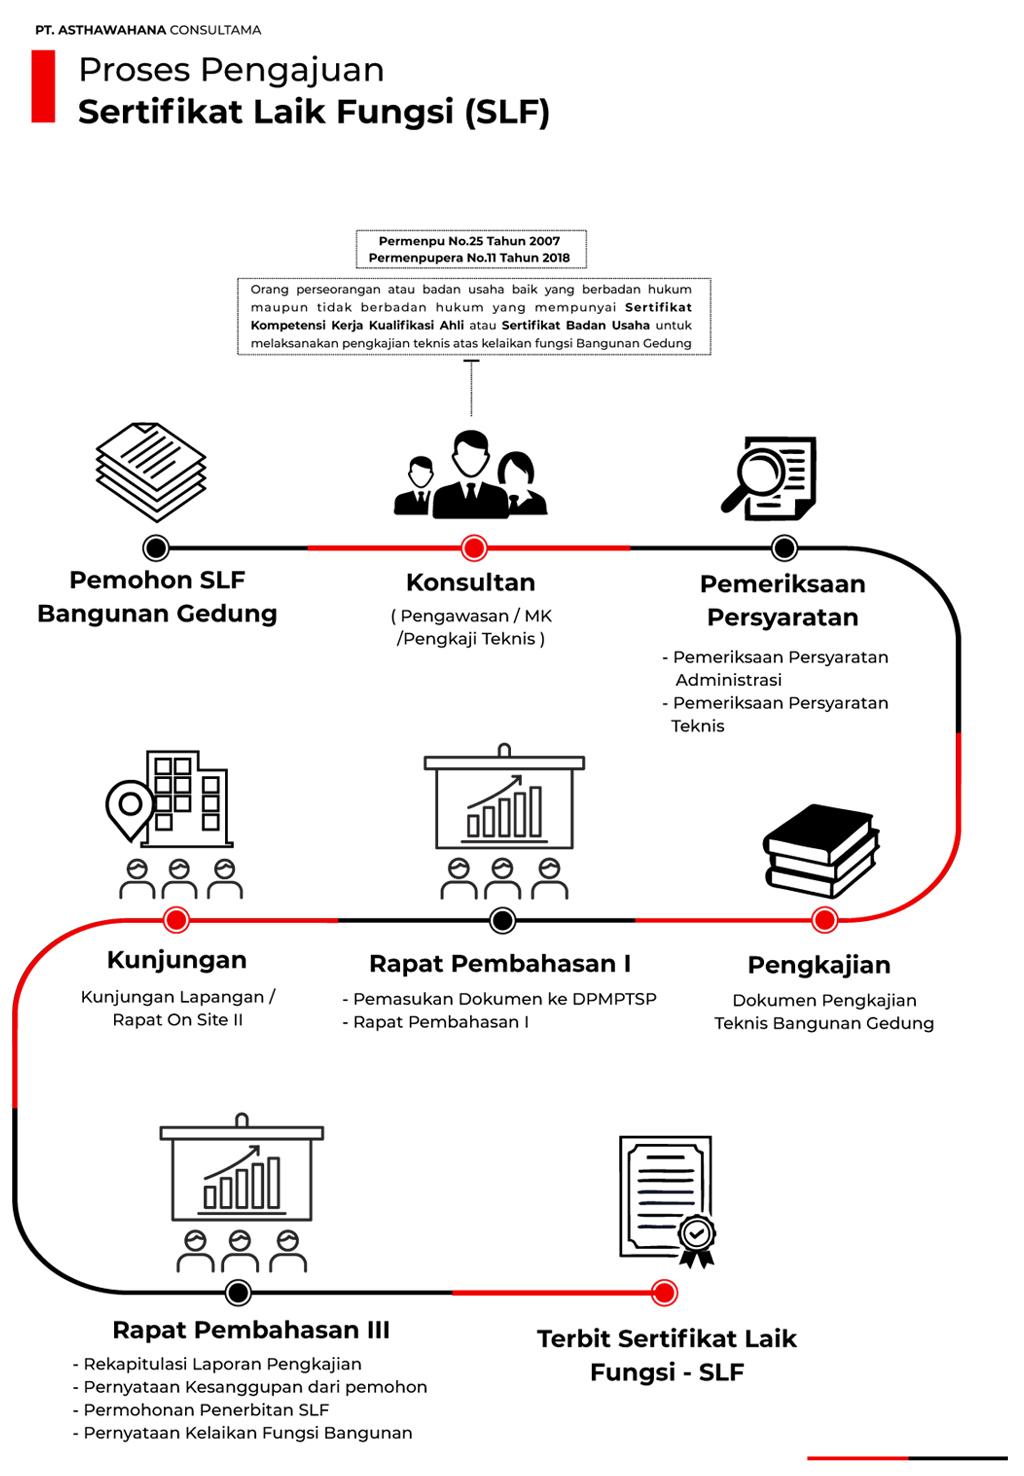 Proses Pengajuan SLF Sertifikat Laik Fungsi - Jasa Konsultan SLF